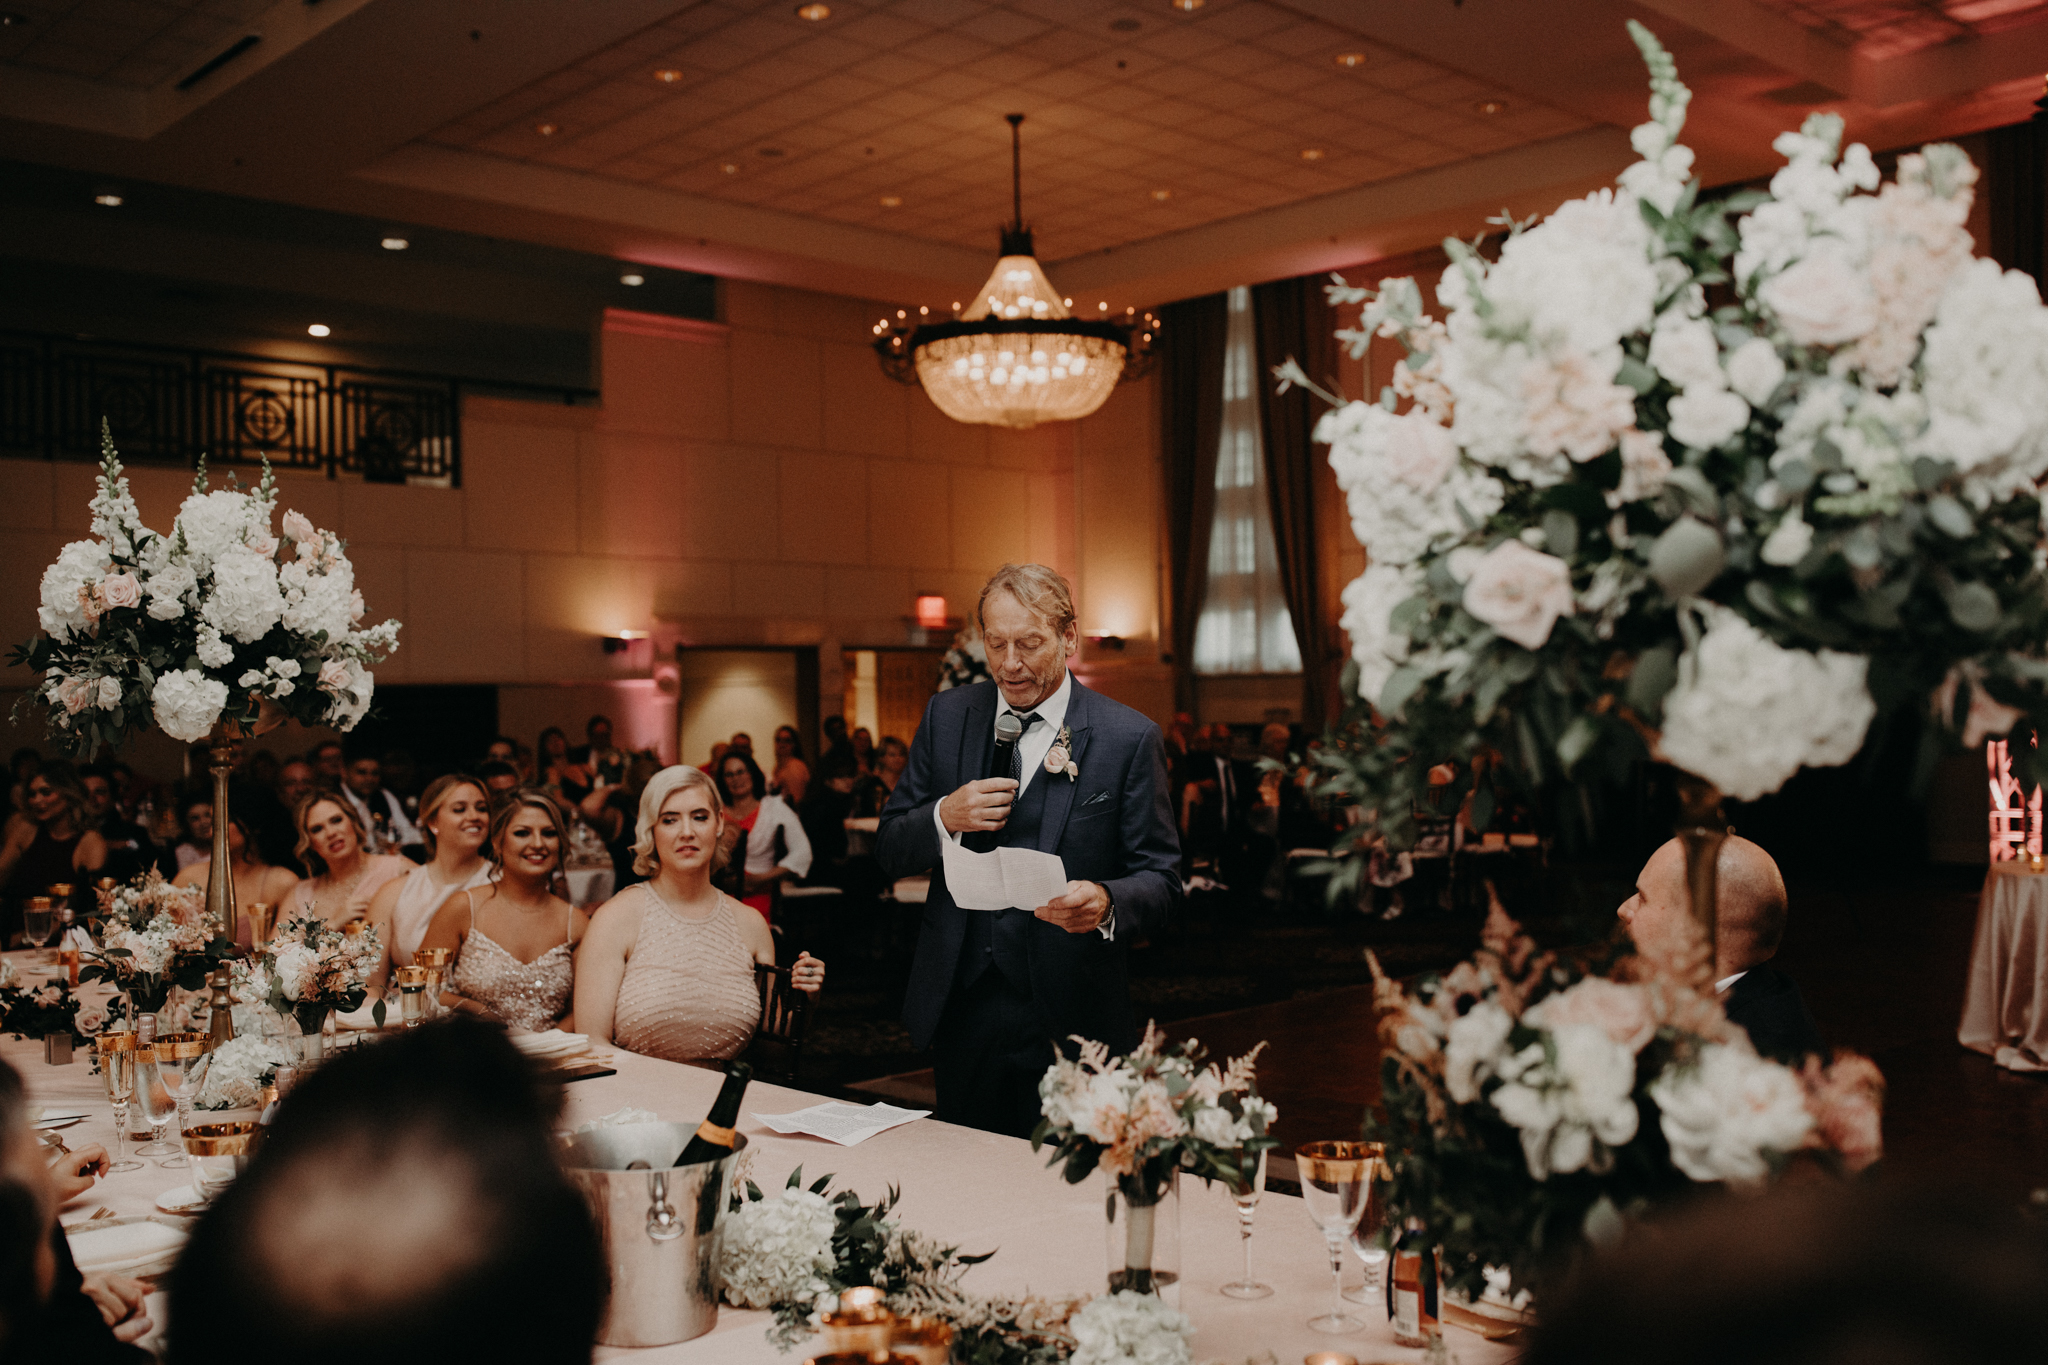 The-Inn-At-St-Johns-Wedding-46.jpg